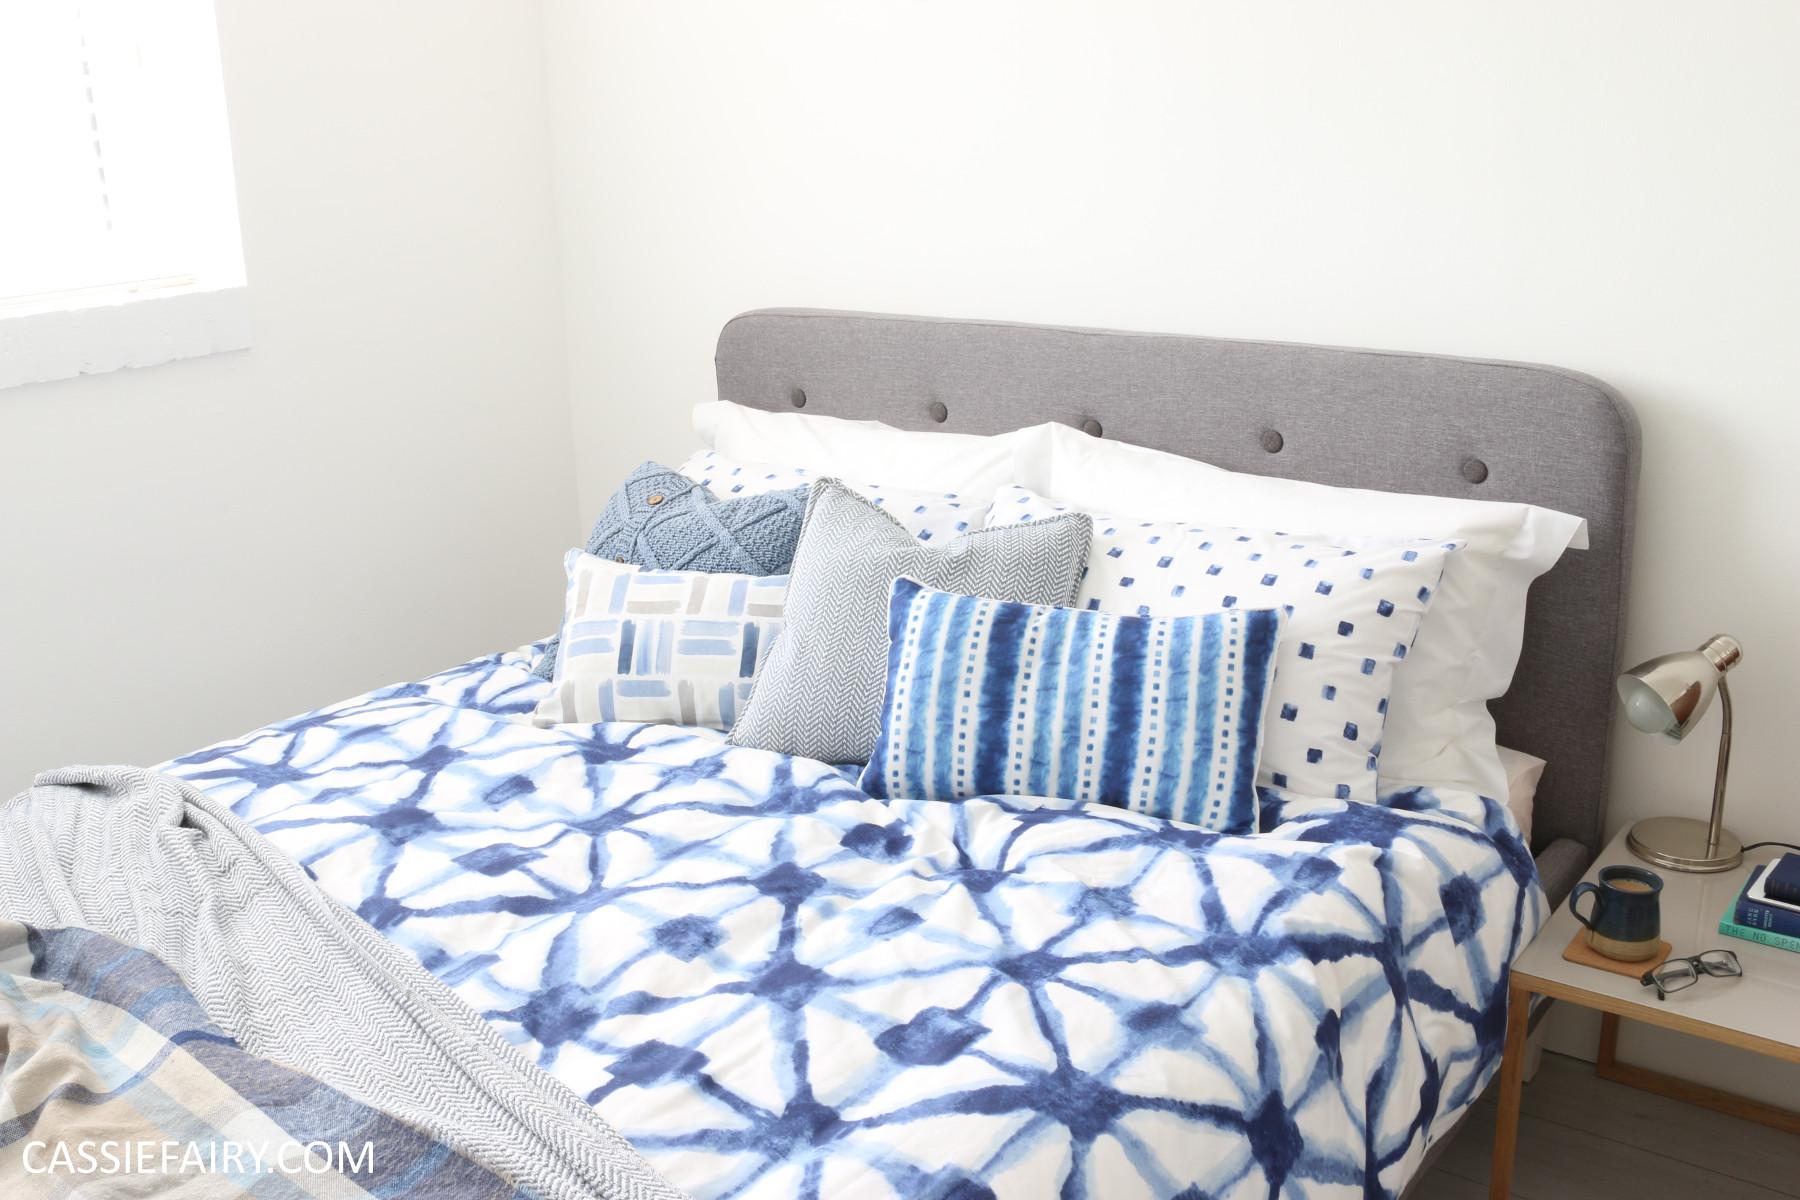 Spring summer coastal holiday bedding theme-10